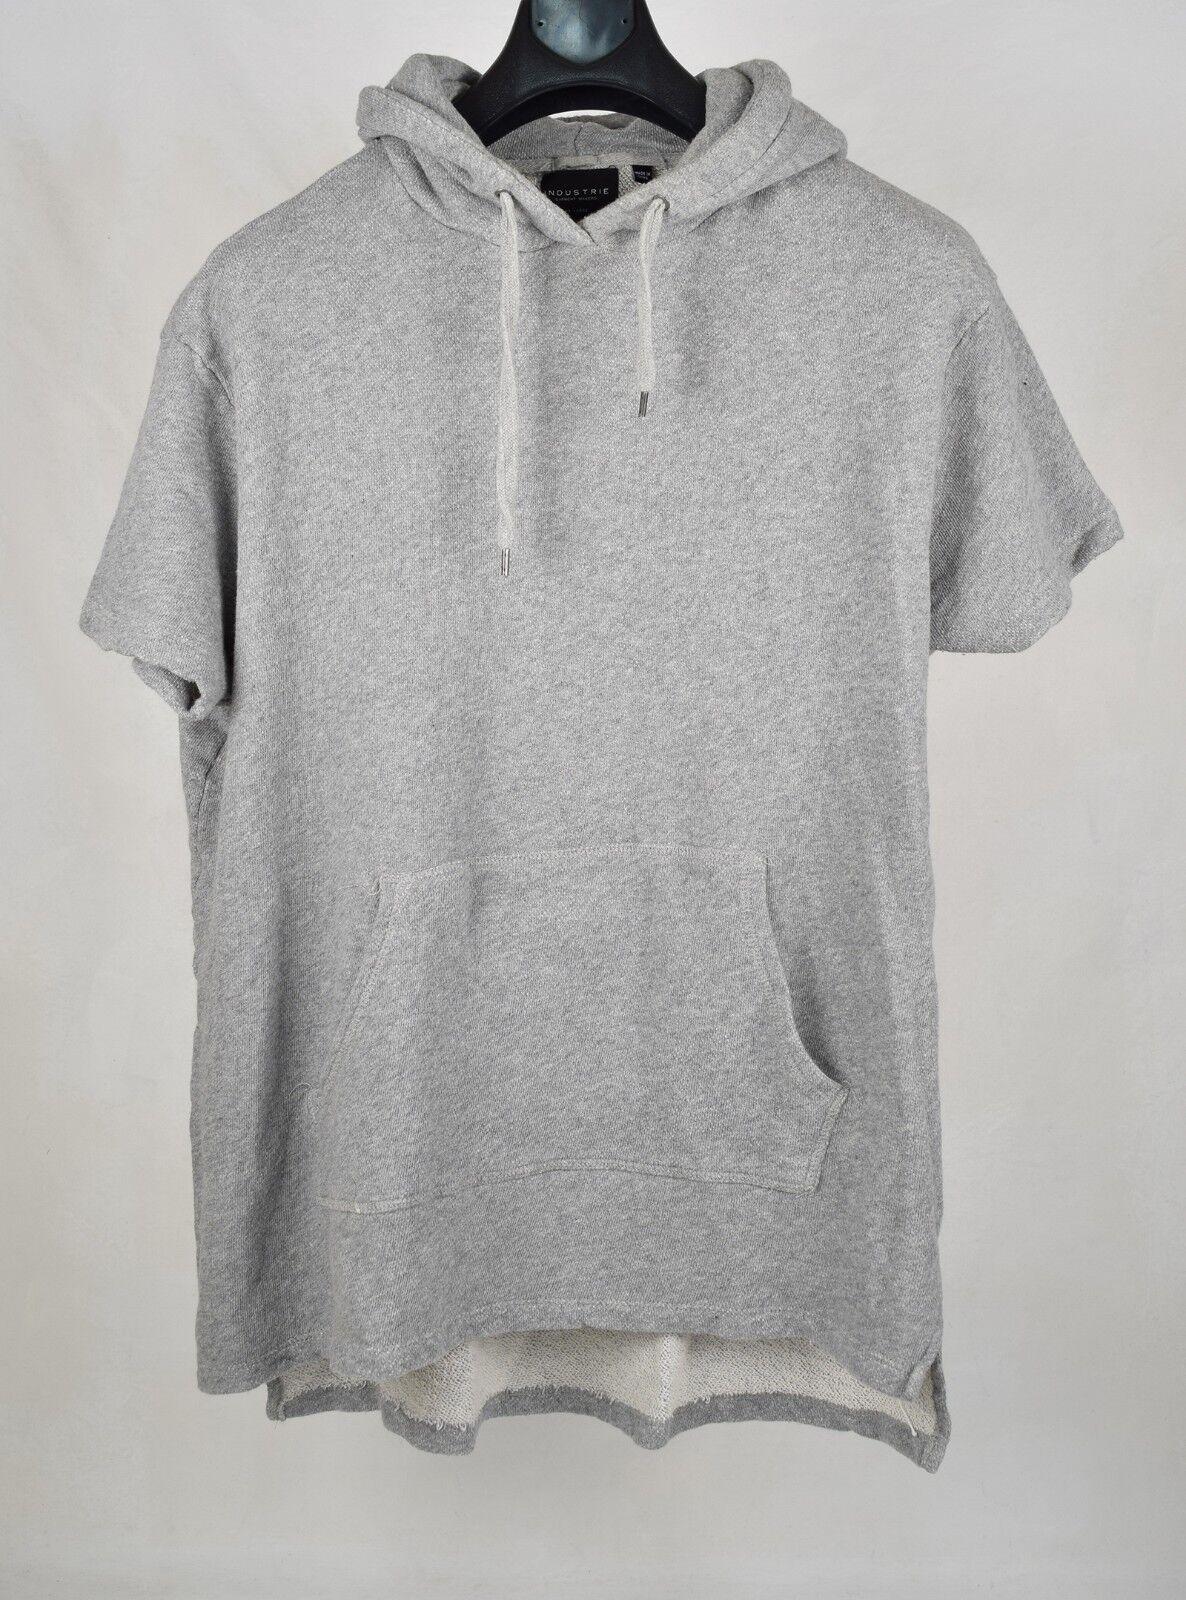 Industrie Hoodie Fleece Pullover Cotton Grau SS 2XL